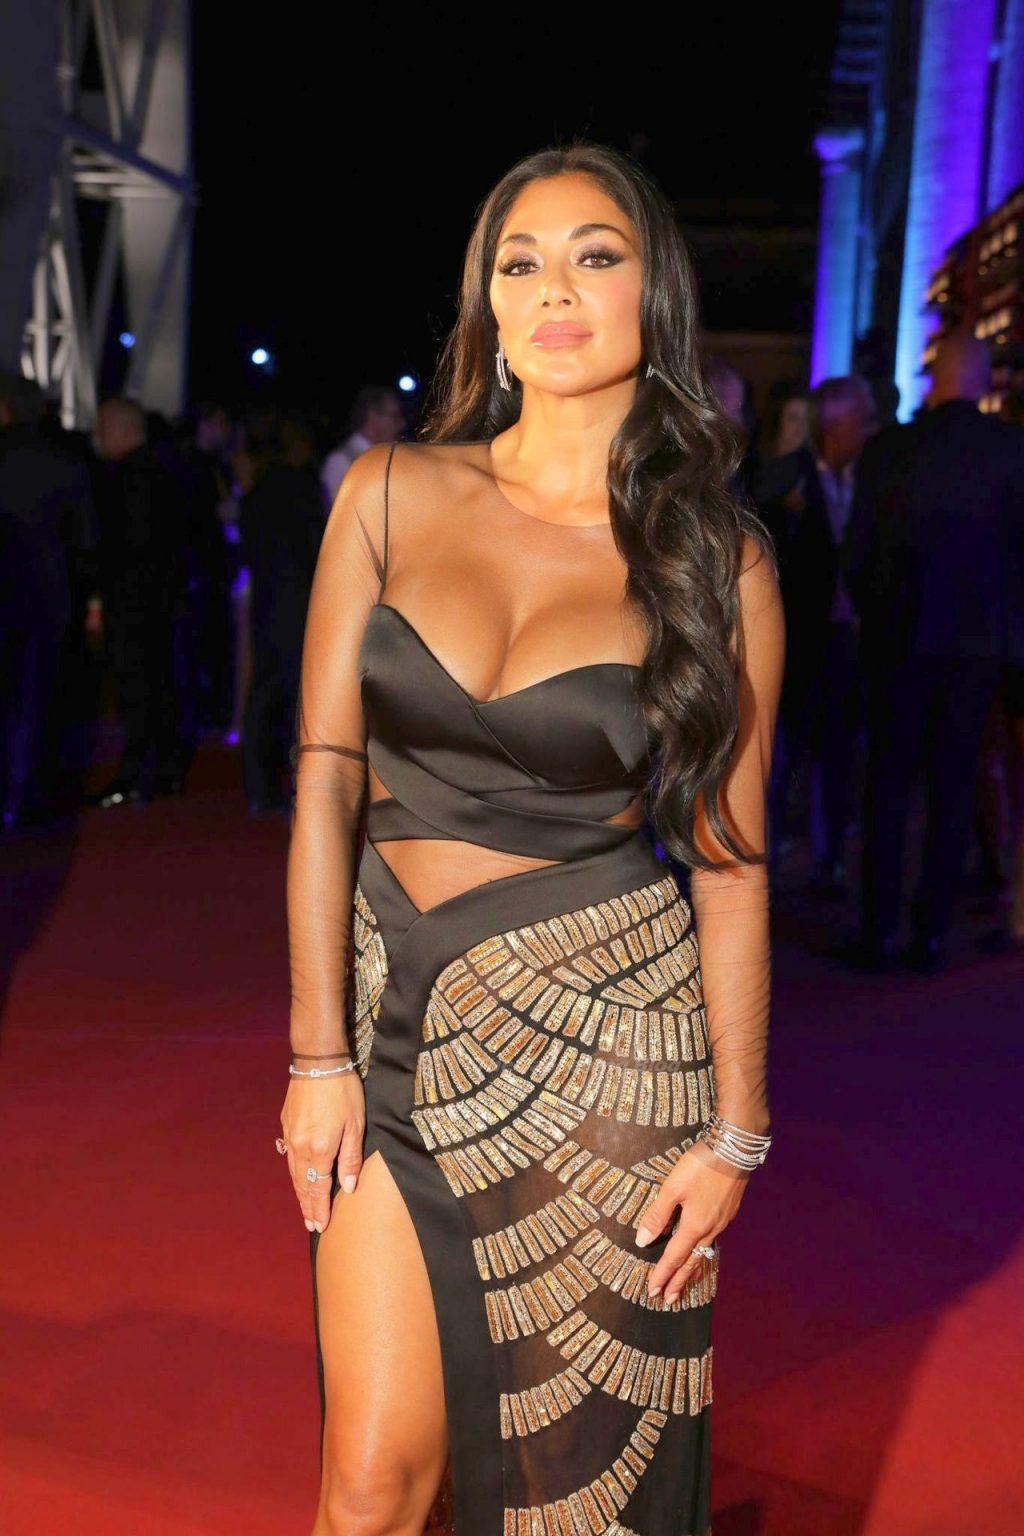 Nicole Scherzinger Puts on a Busty Display at the amfAR Gala (34 Photos)